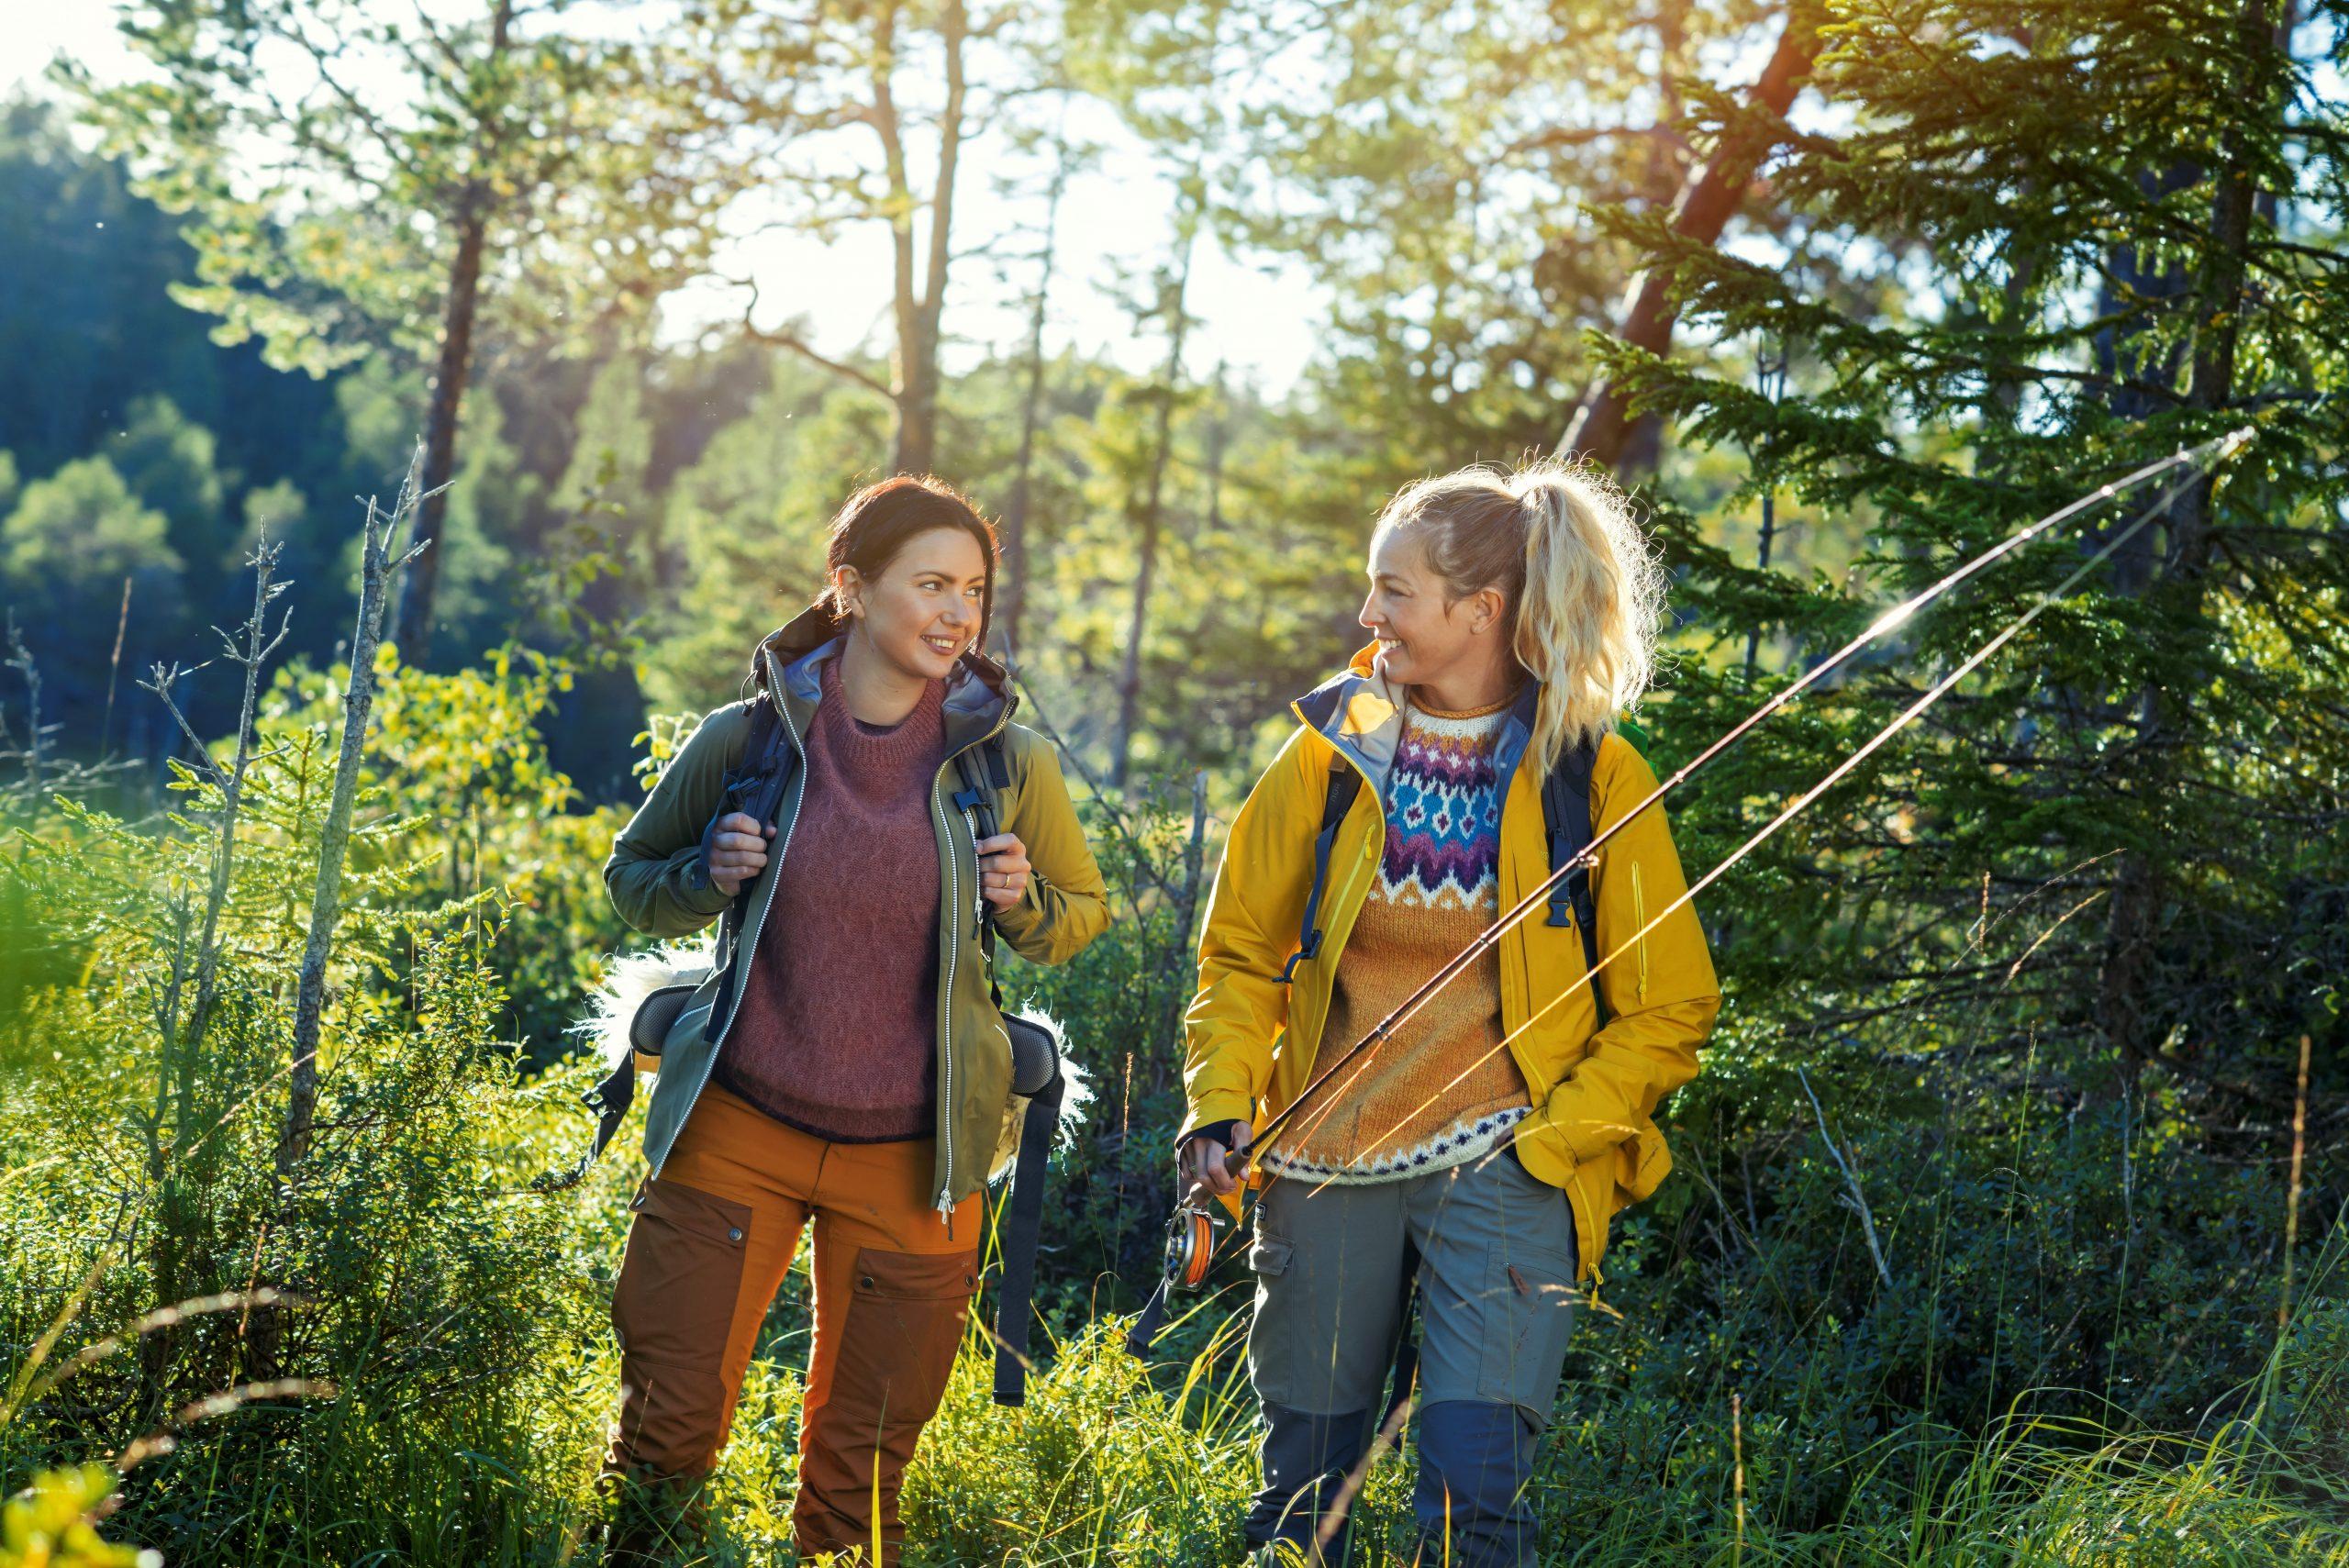 To damer på fisketur i Namdalen. Foto: Buckethaus